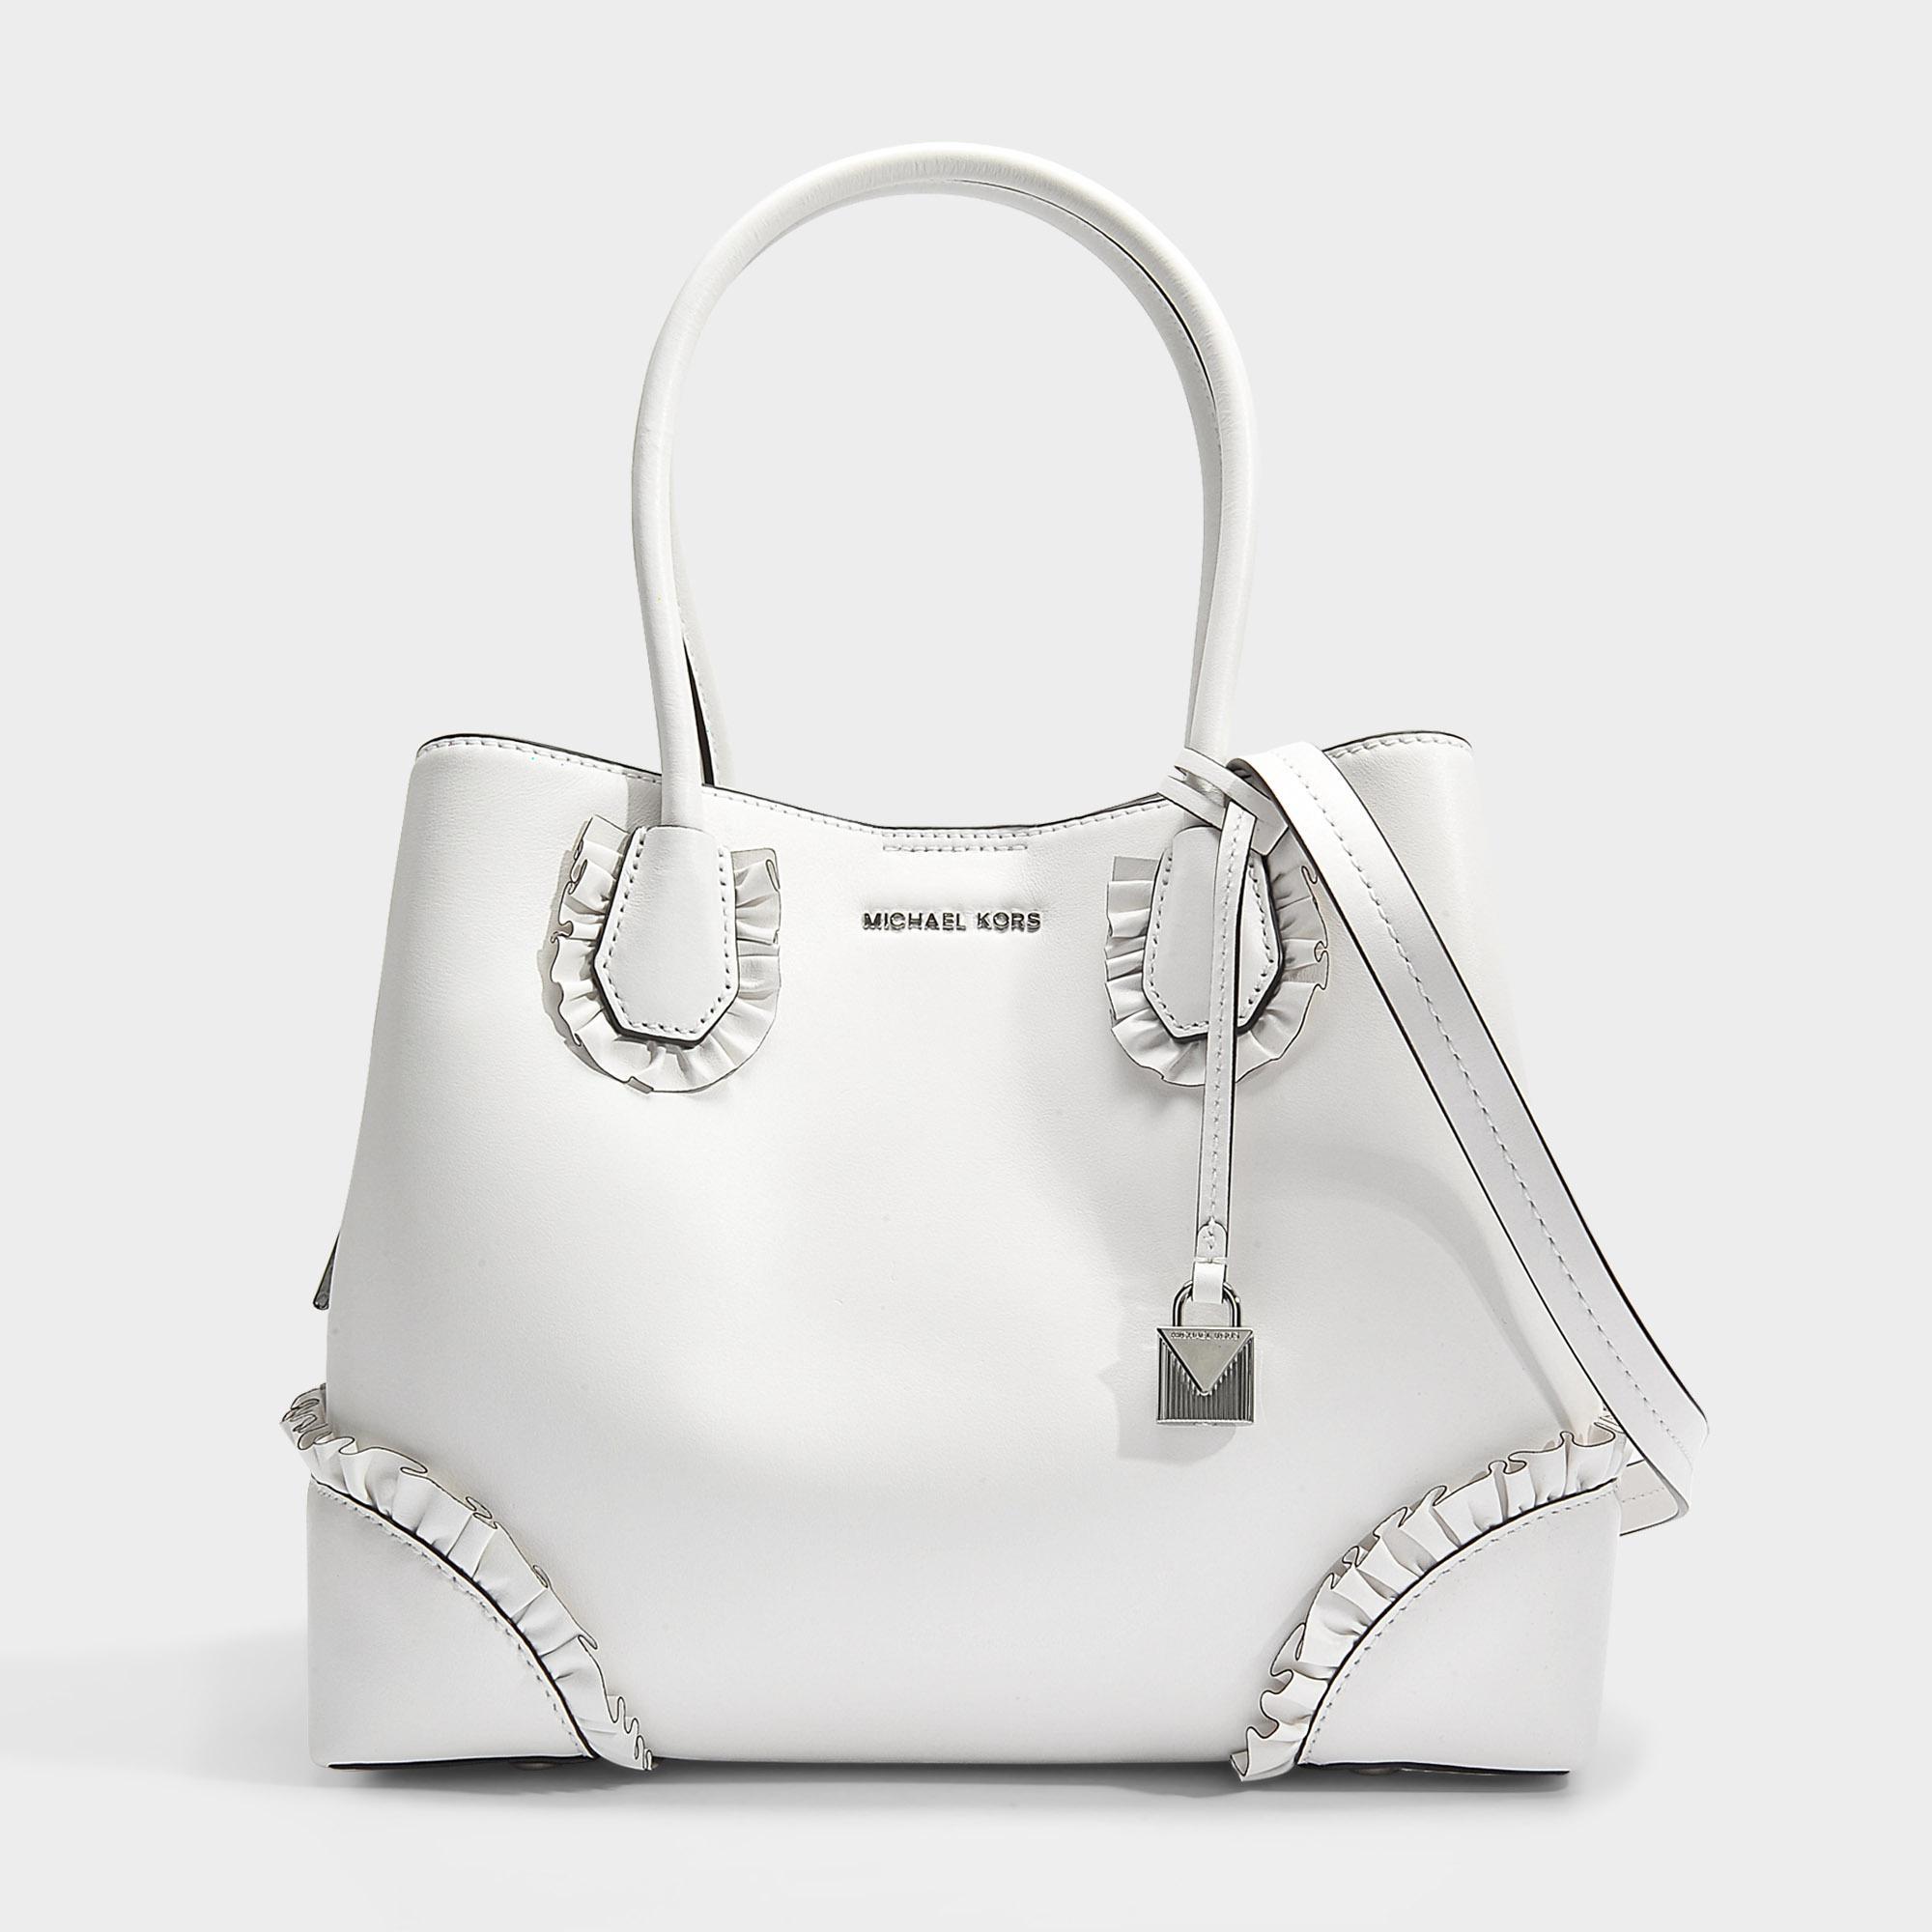 Mercer Gallery Center Zip Medium Tote Bag With Ruffles in Optic White Polished Leather Michael Michael Kors 1MvHoJ